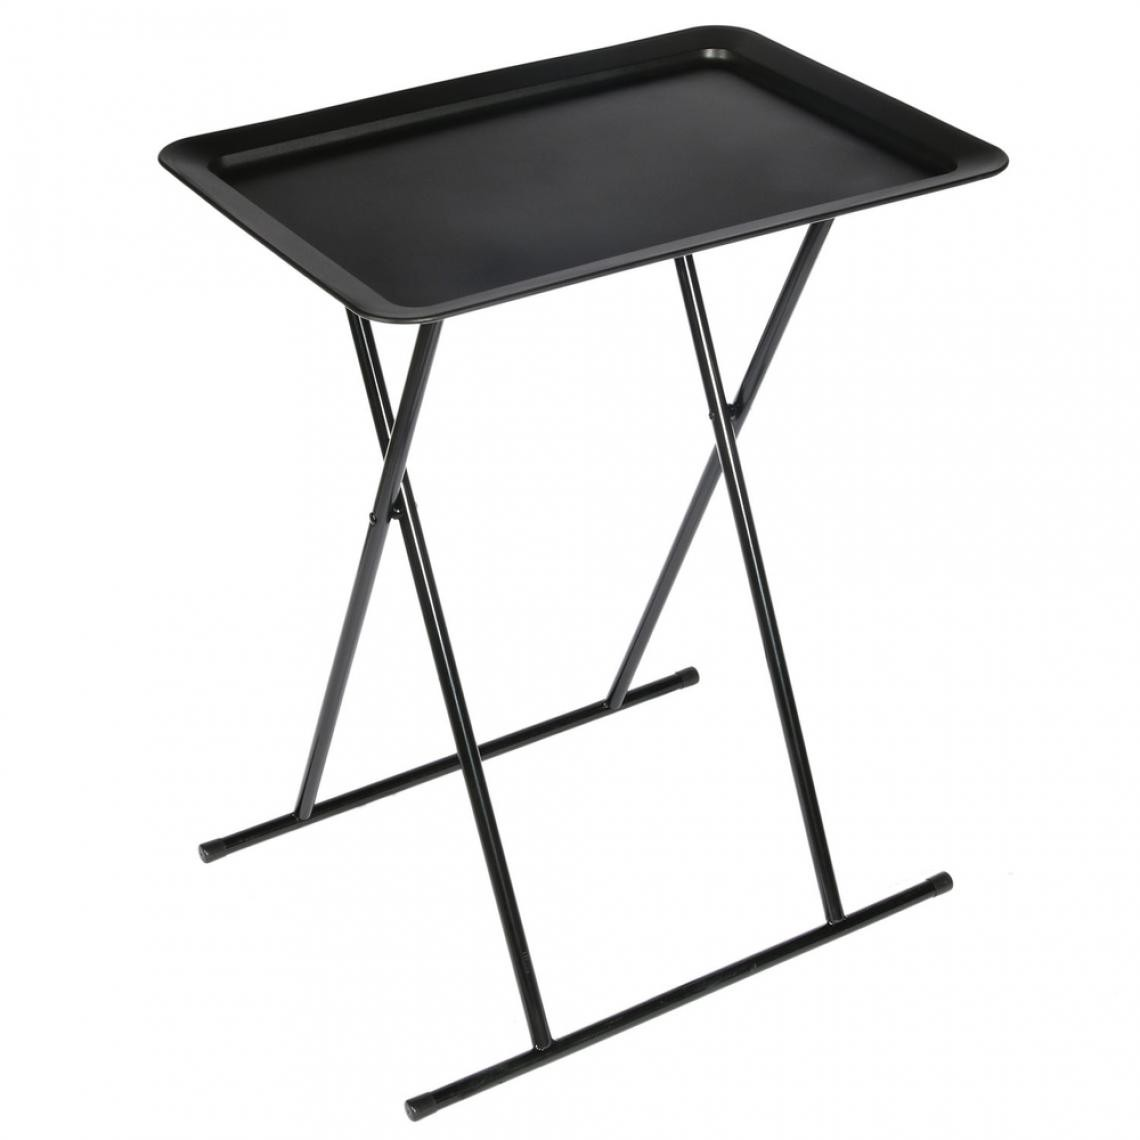 table d appoint pliable noire simply